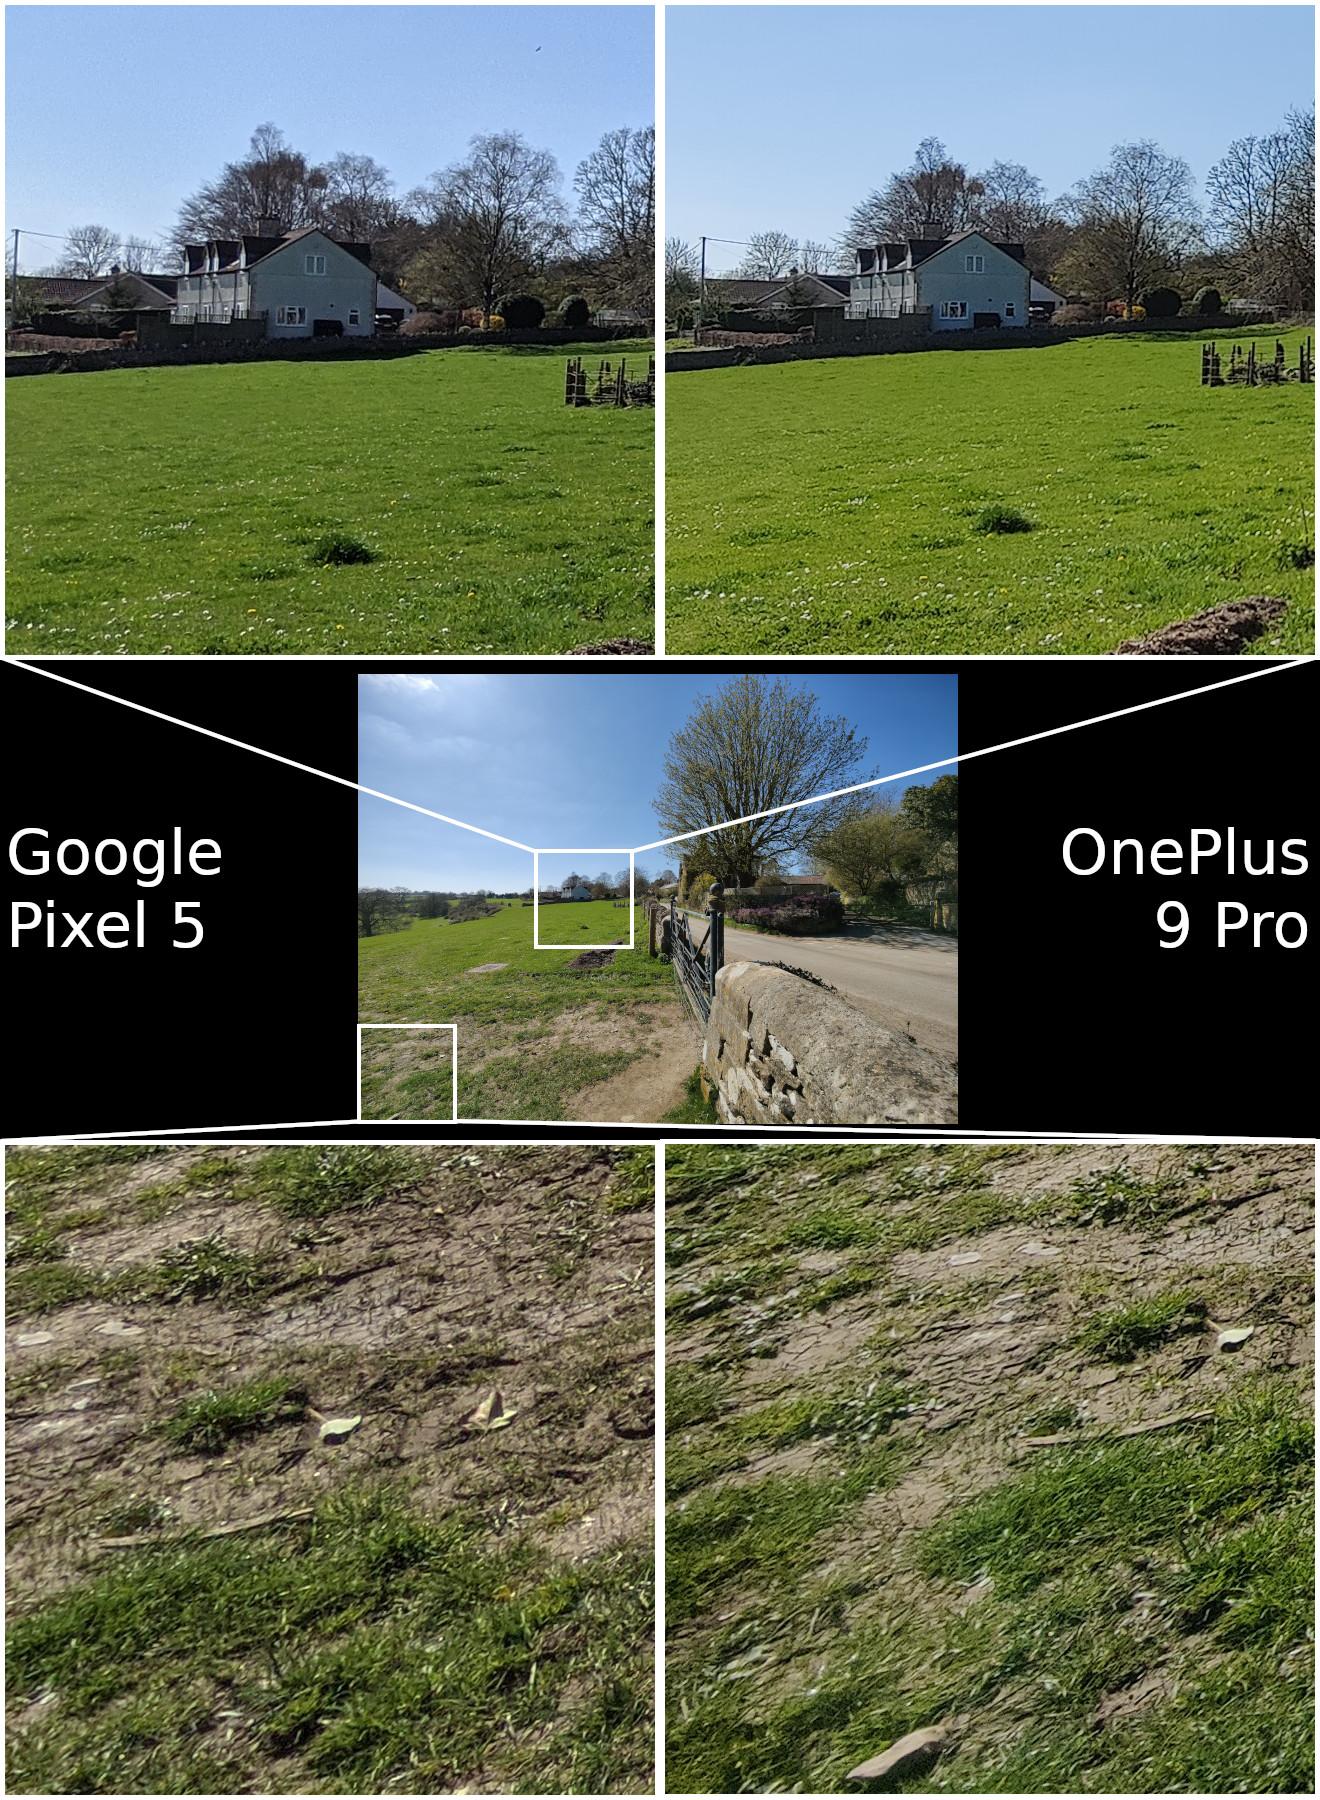 Google Pixel 5 vs OnePlus 9 Pro wide